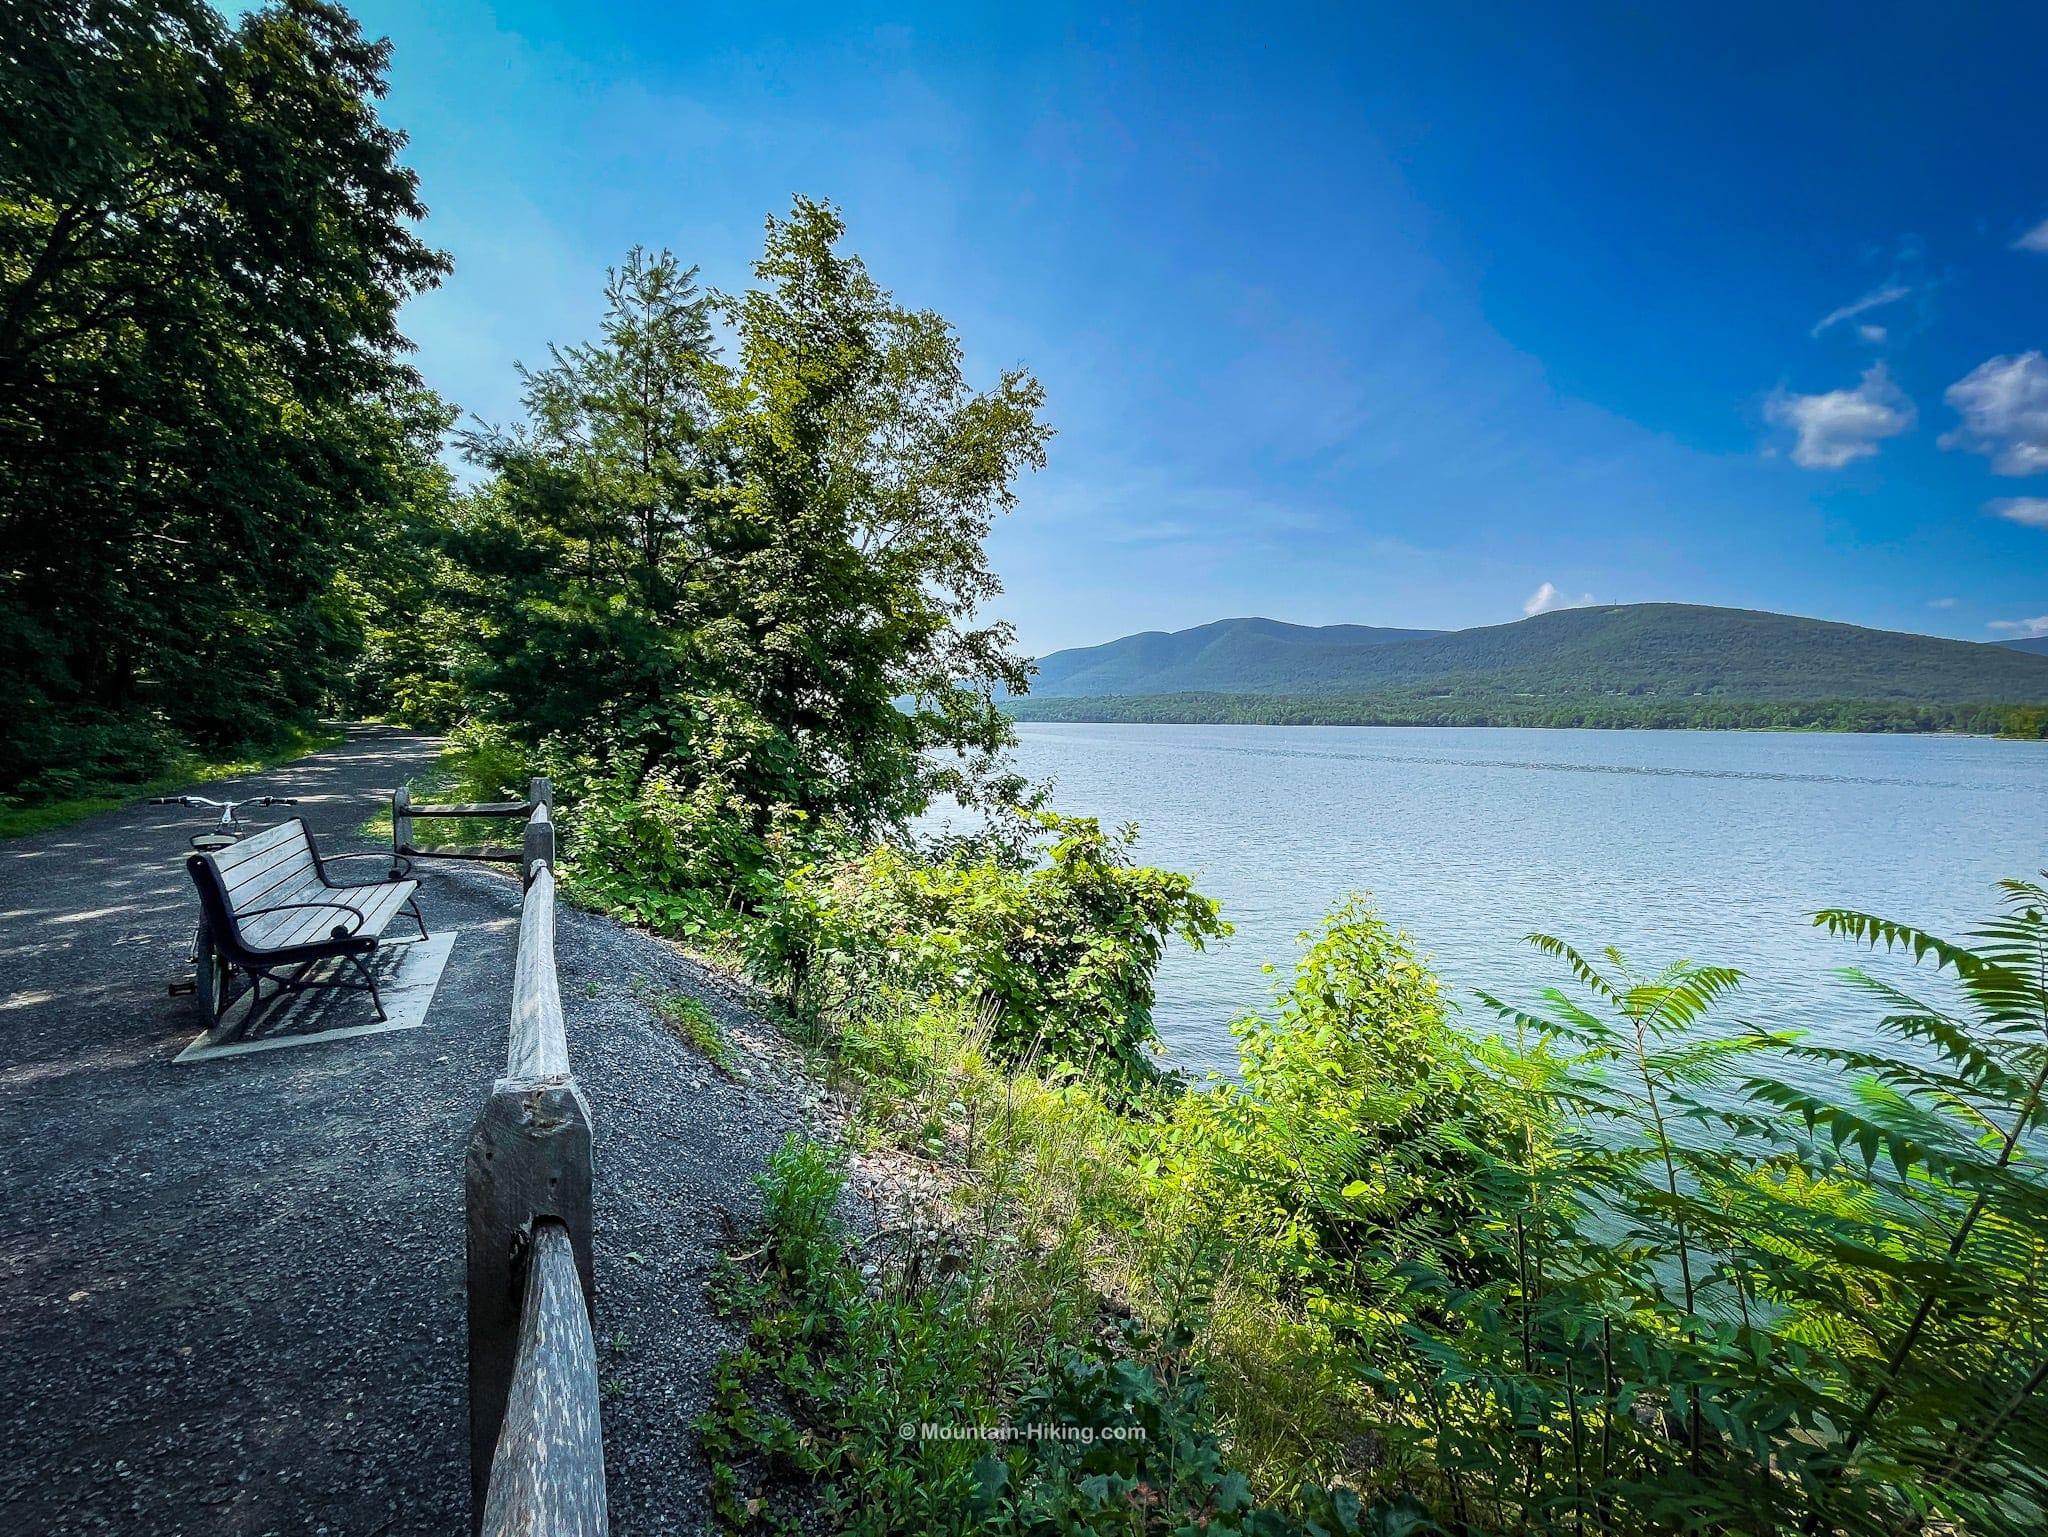 Ashokan Rail Trail wooden bench beside reservoir with mountain views